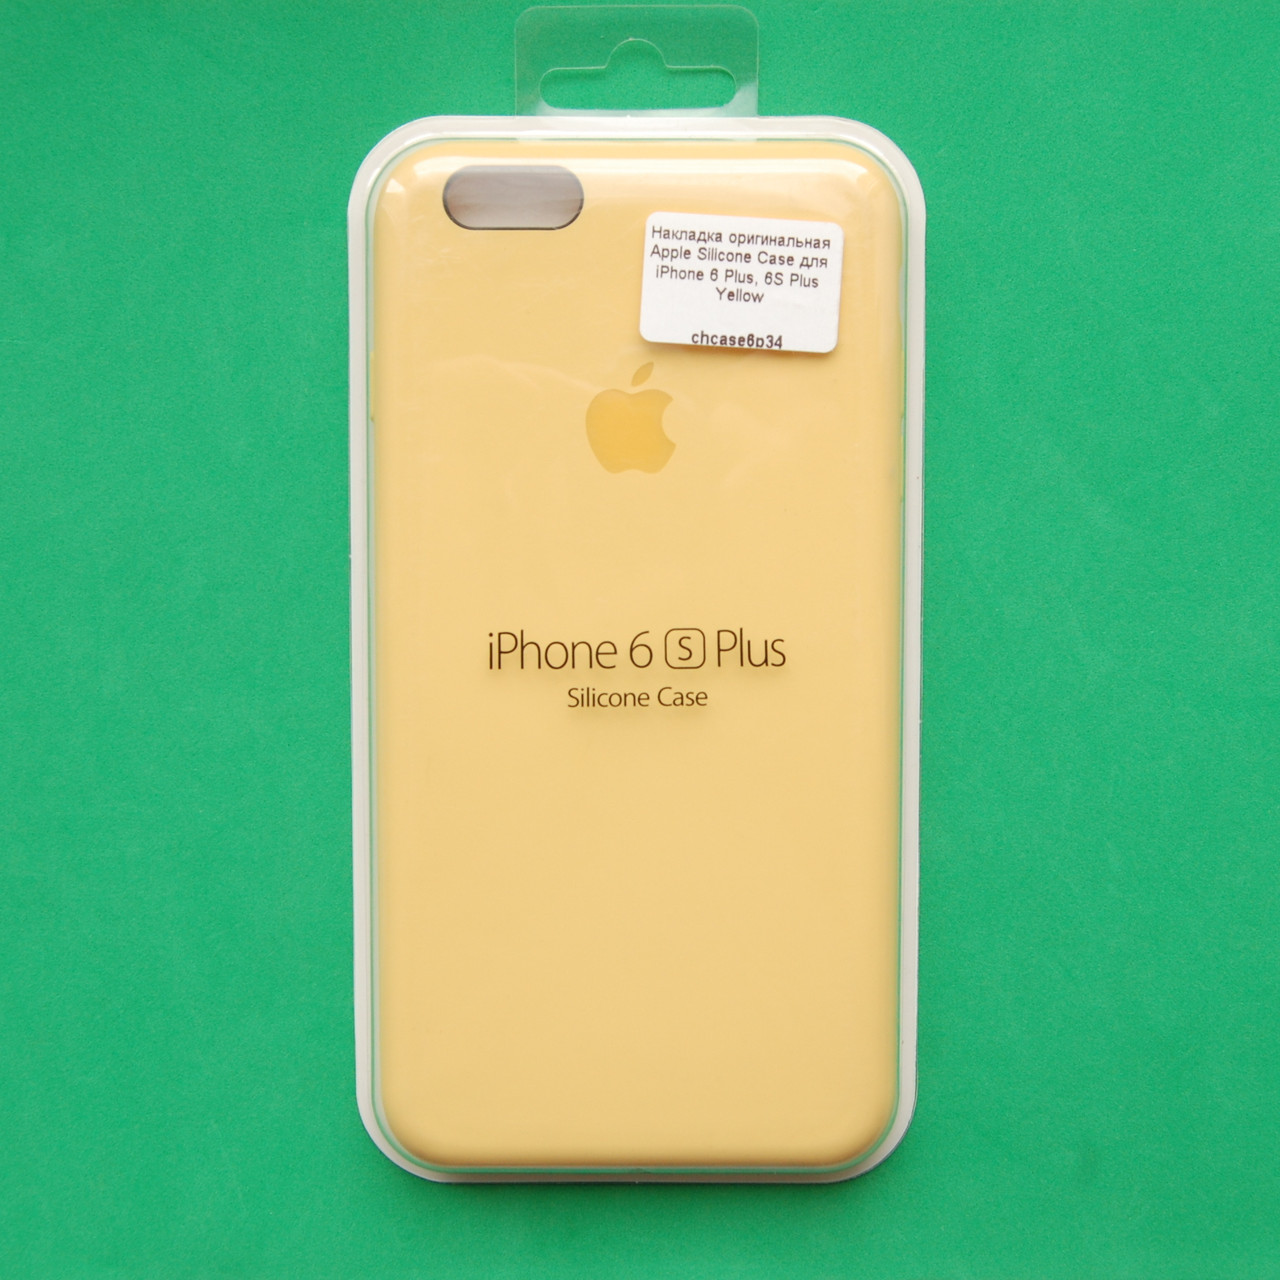 Накладка оригинальная Apple Silicone Case для iPhone 6 Plus, 6S Plus Yellow